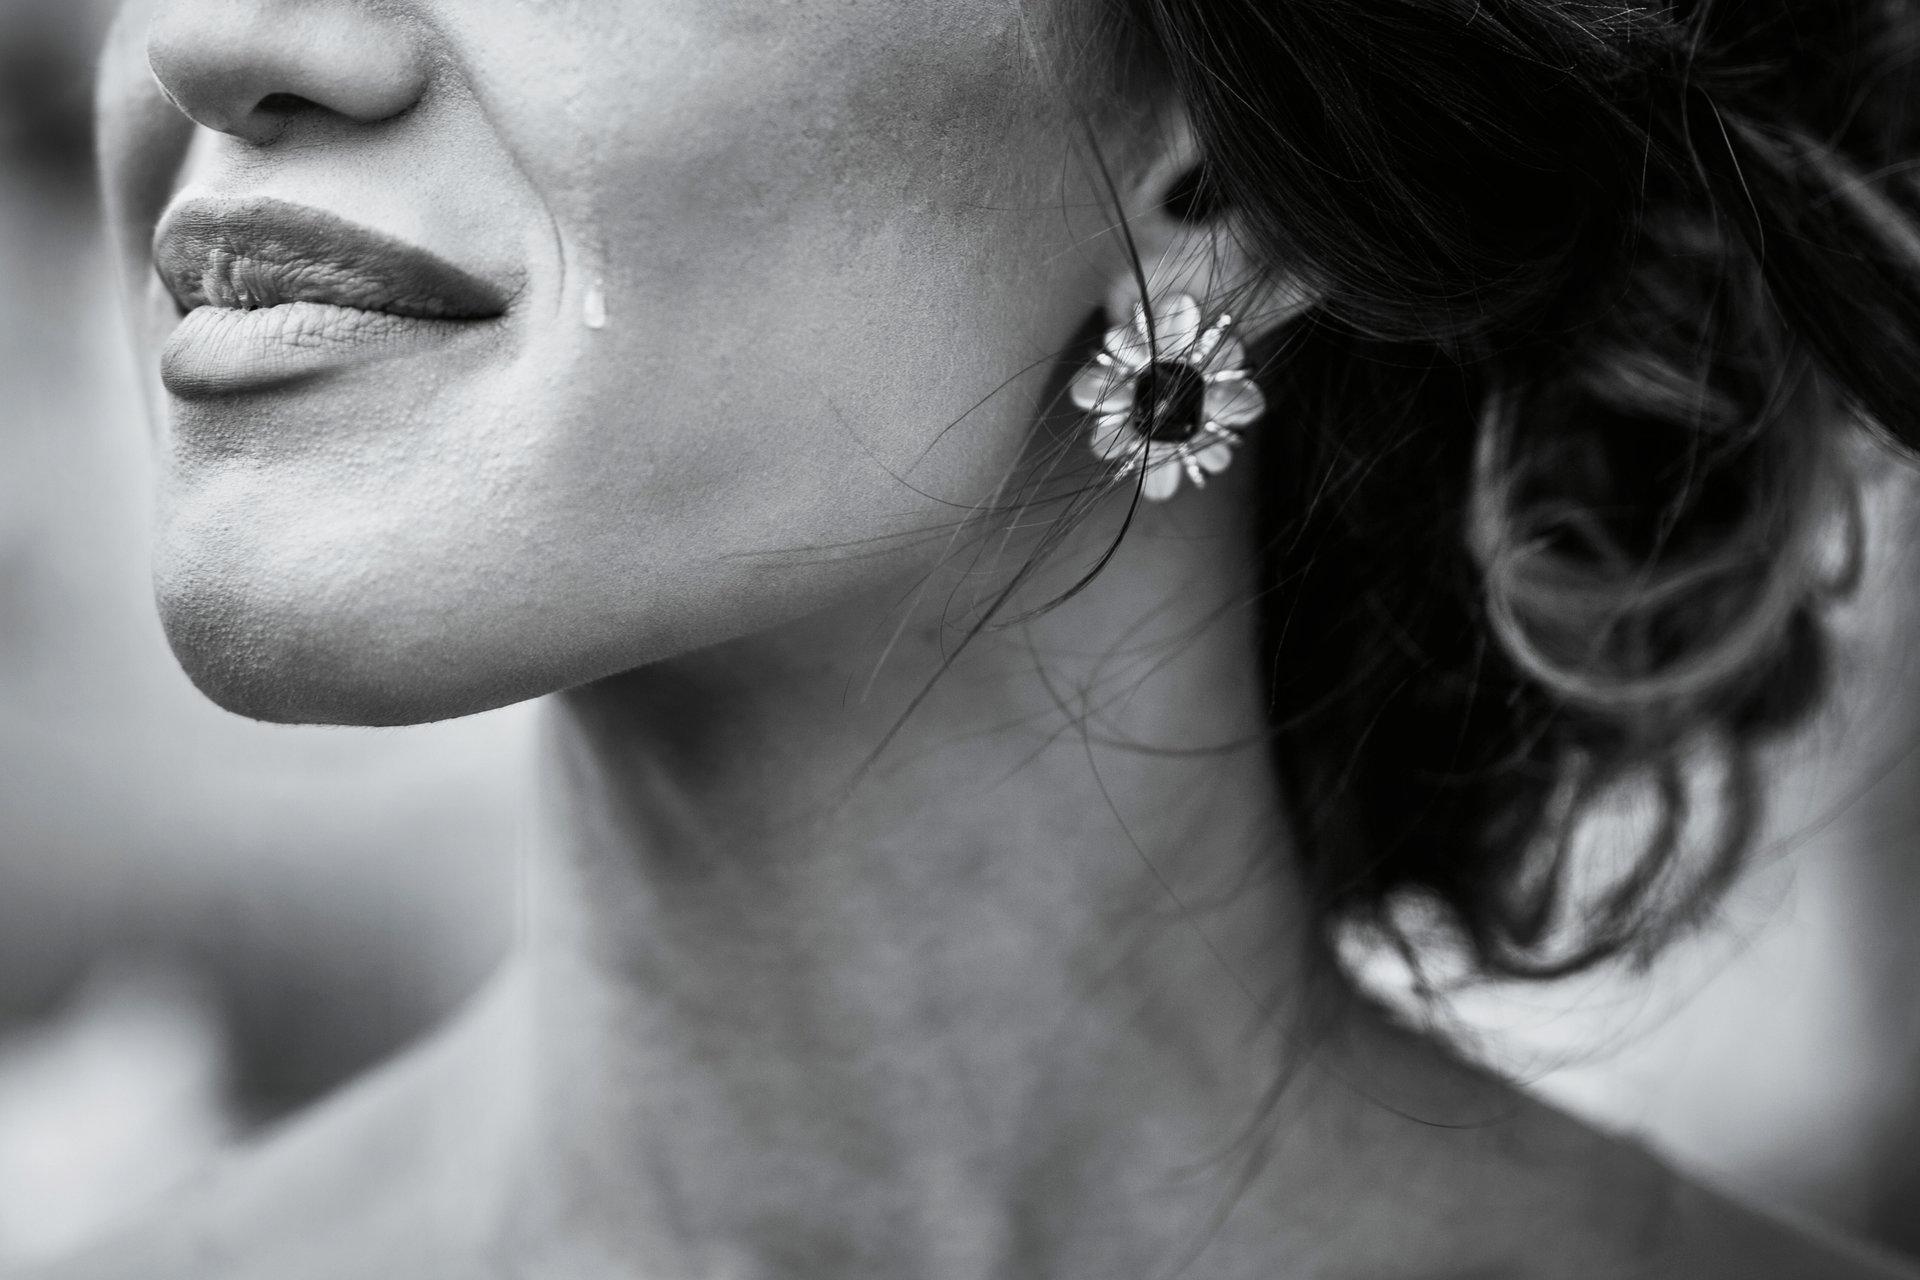 Photo in Wedding | Author ivelin_iliev | PHOTO FORUM